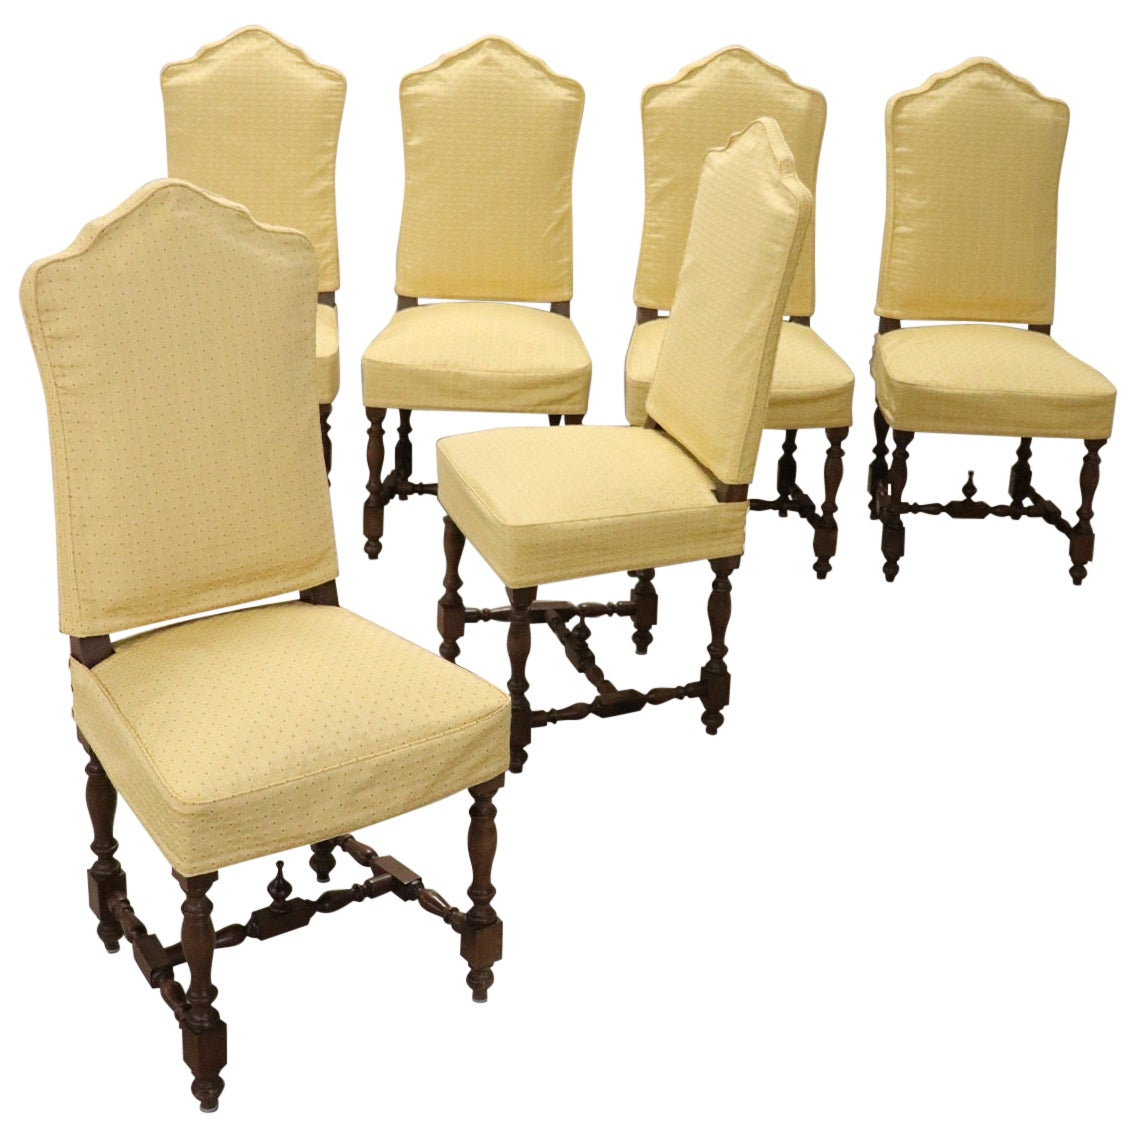 20th Century Italian Louis XIV Style Walnut Wood Chairs, Set of Six